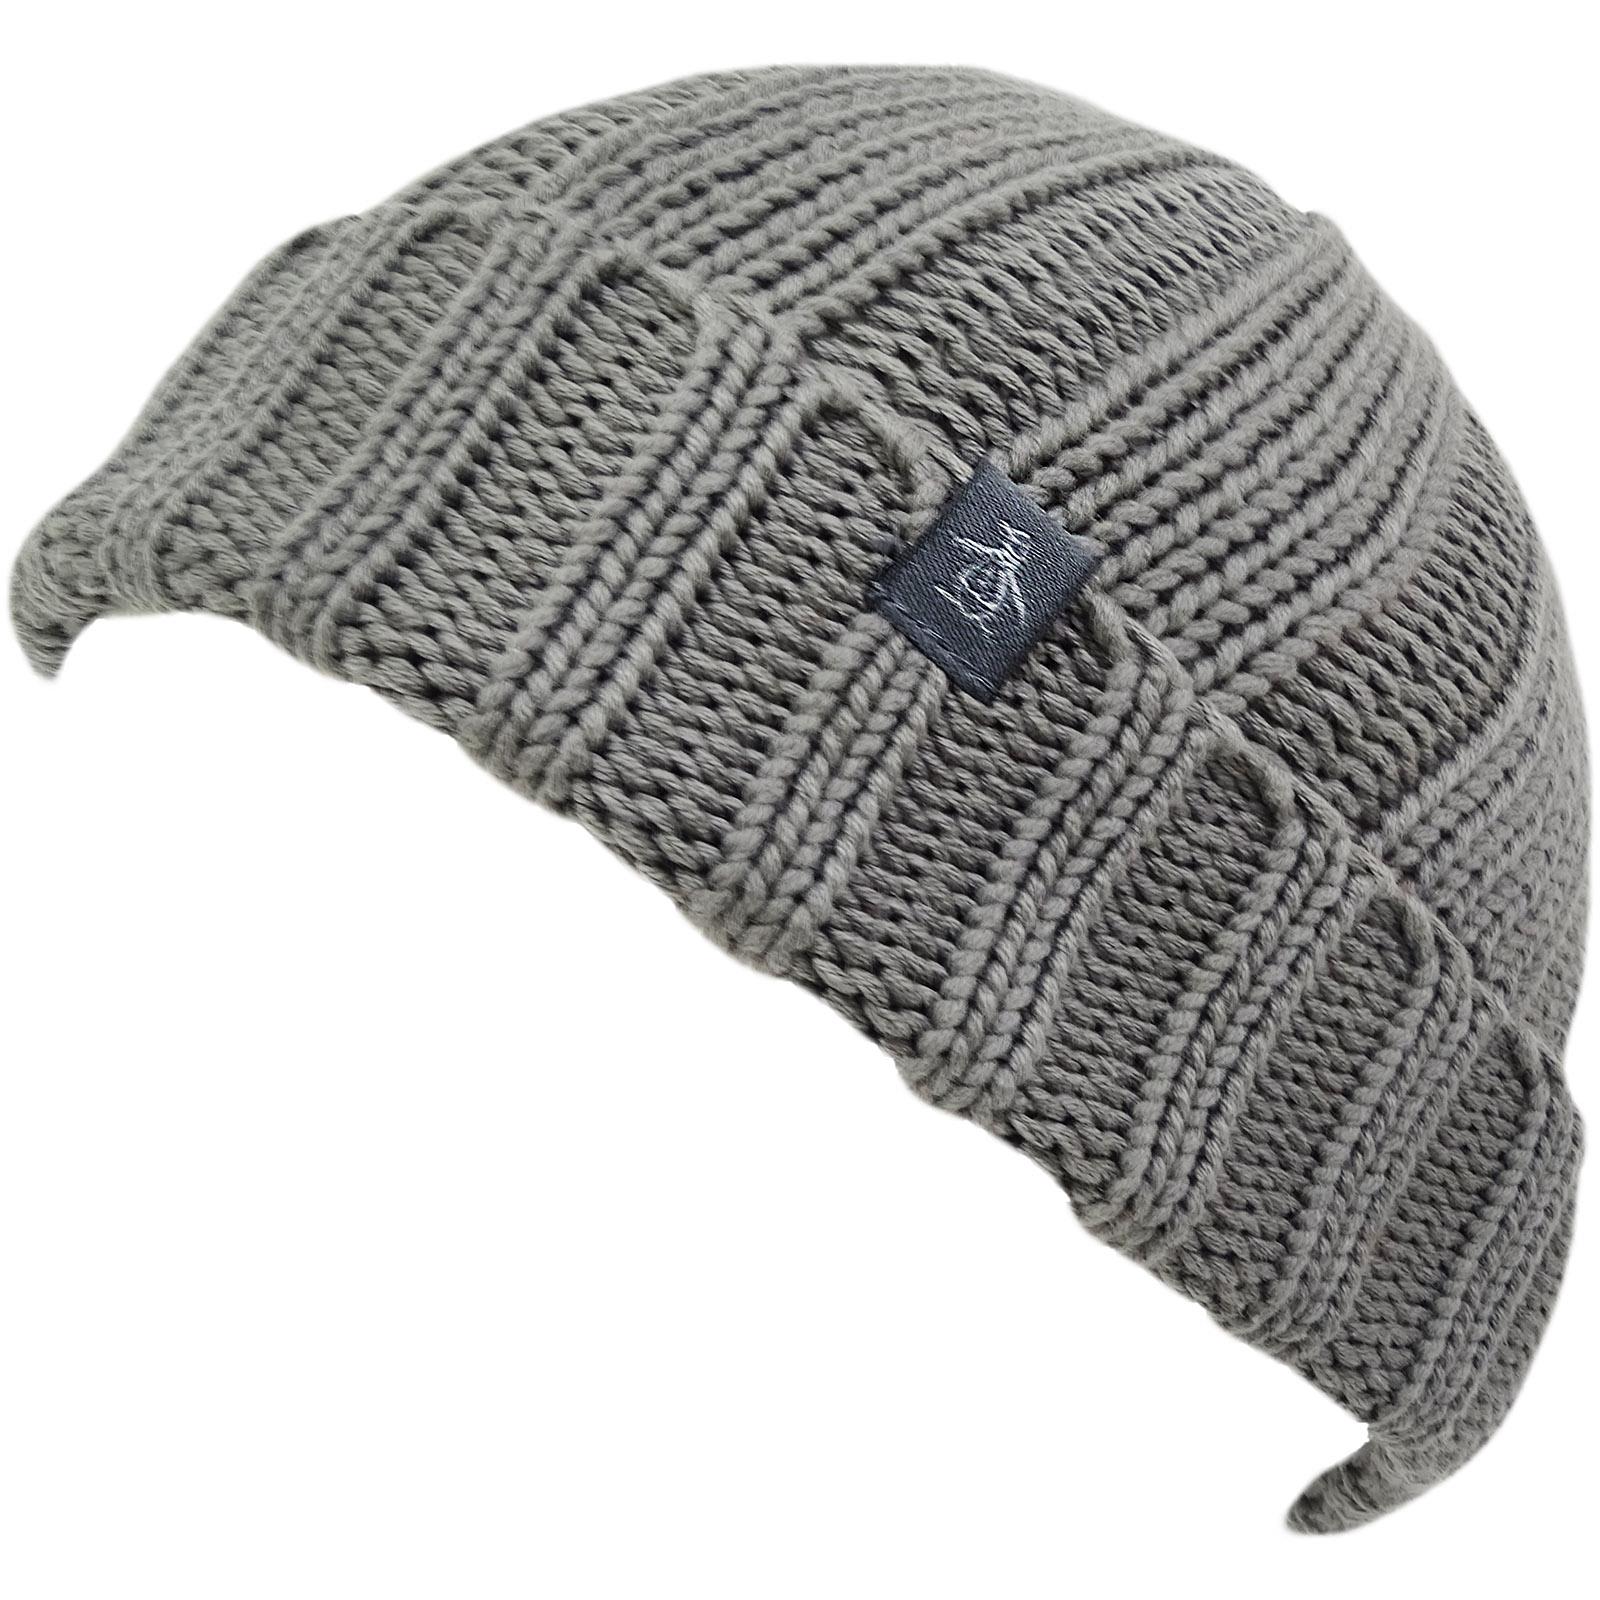 Original-Penguin-plaine-marbree-Beanie-hiver-Headwear-11179